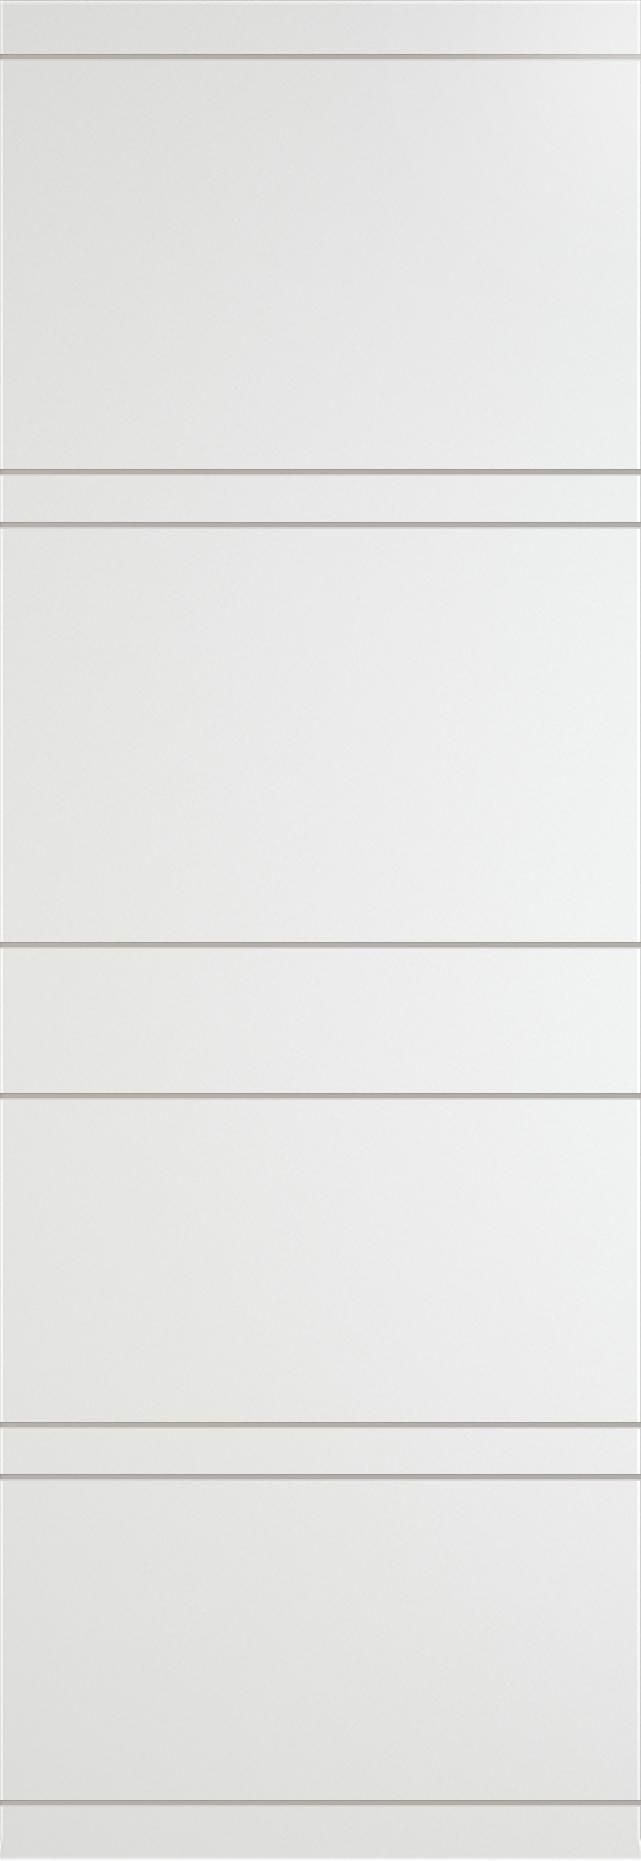 Tivoli Е-2 Invisible цвет - Белая эмаль Без стекла (ДГ)